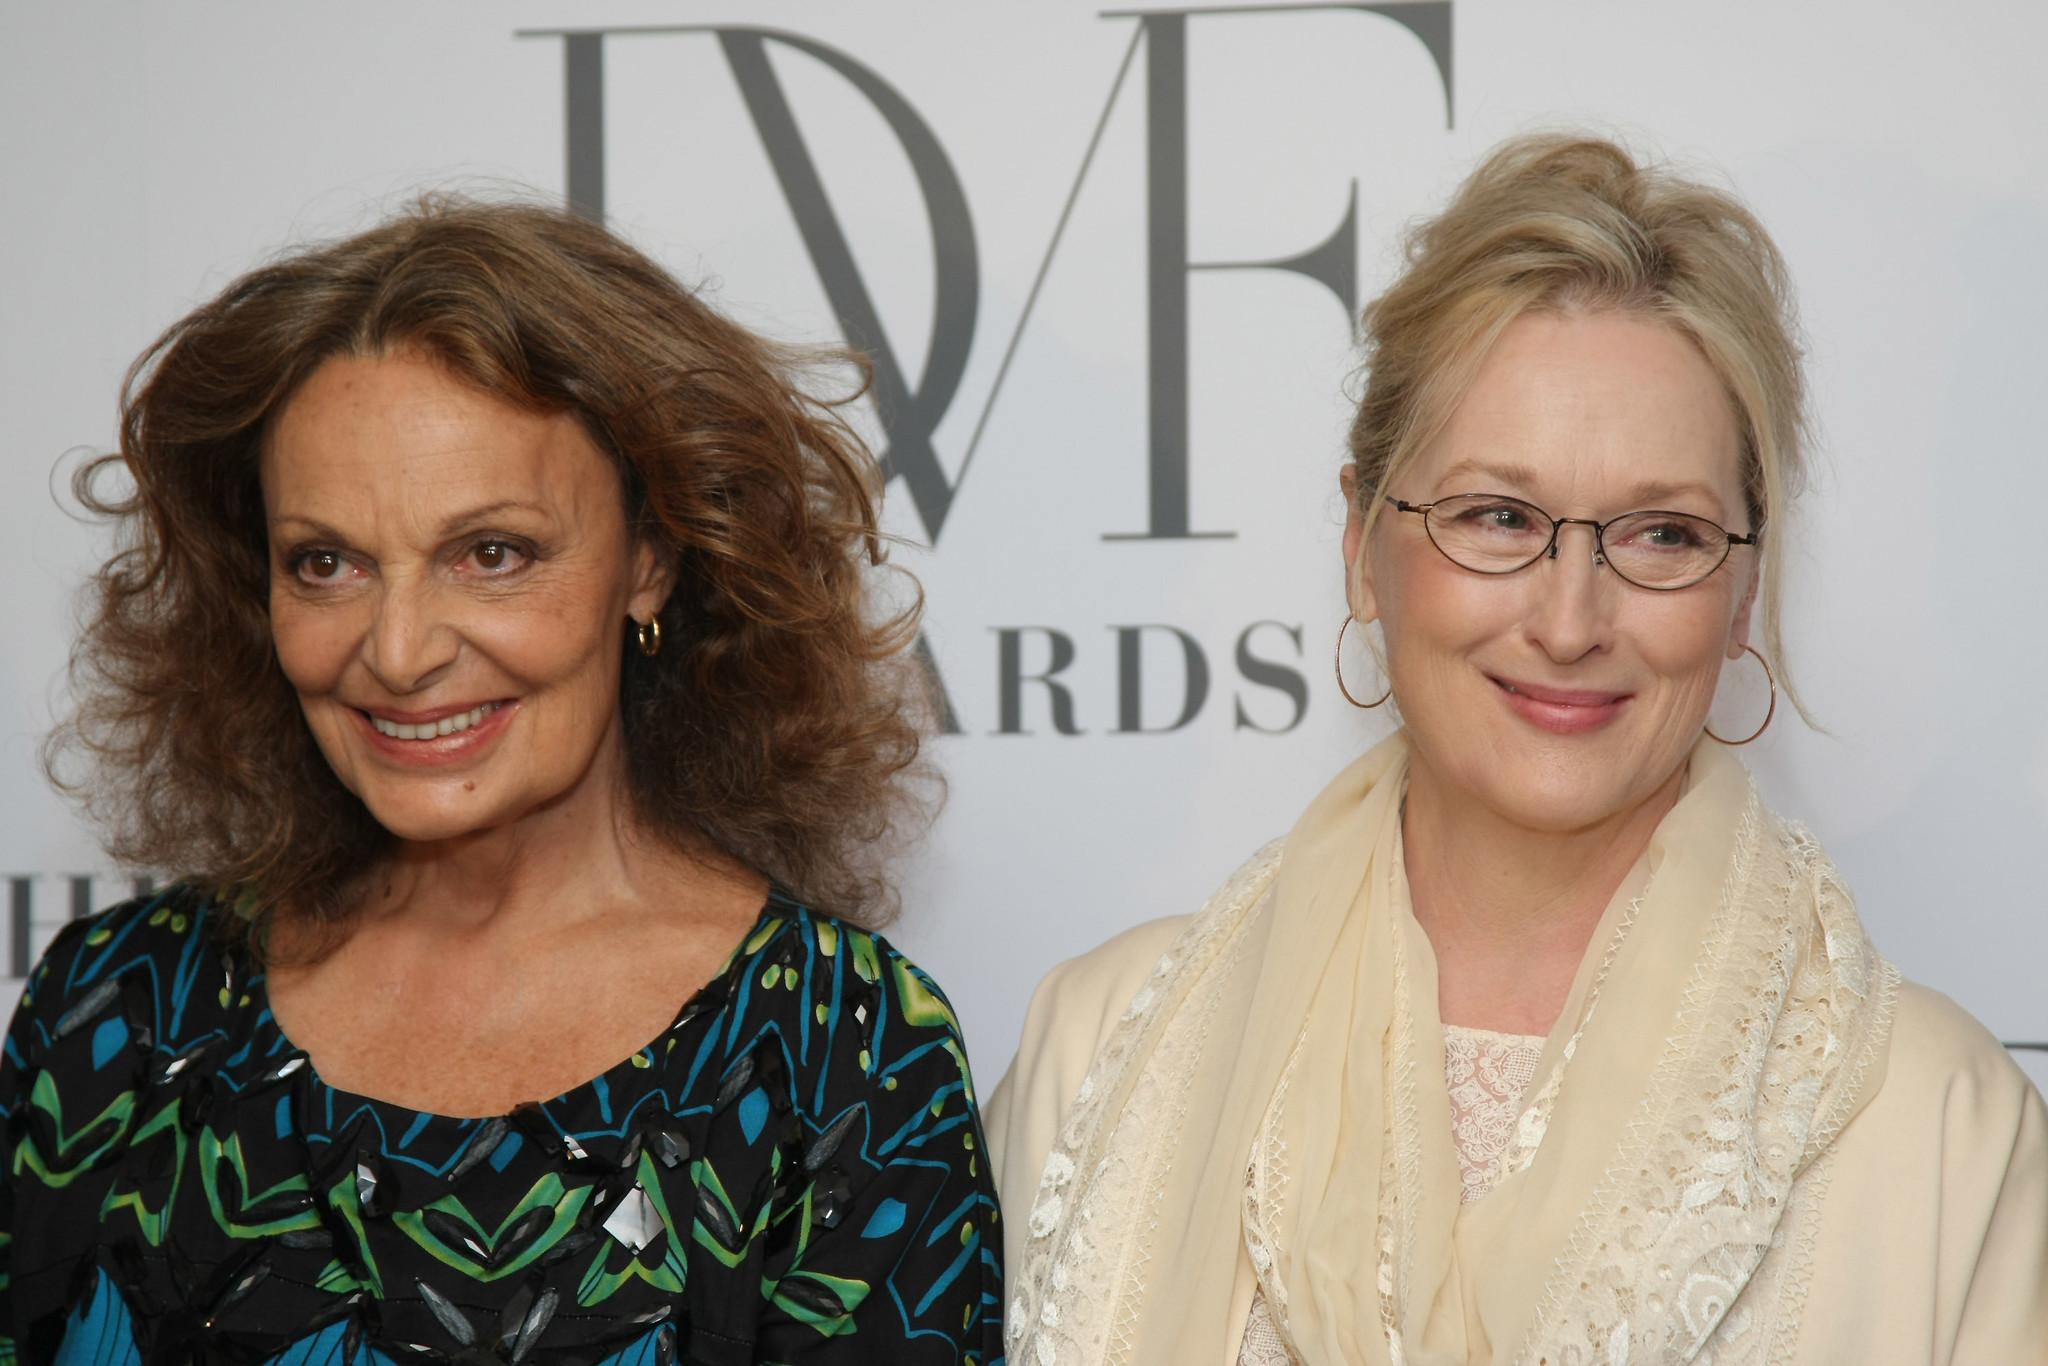 2010 DVF Awards